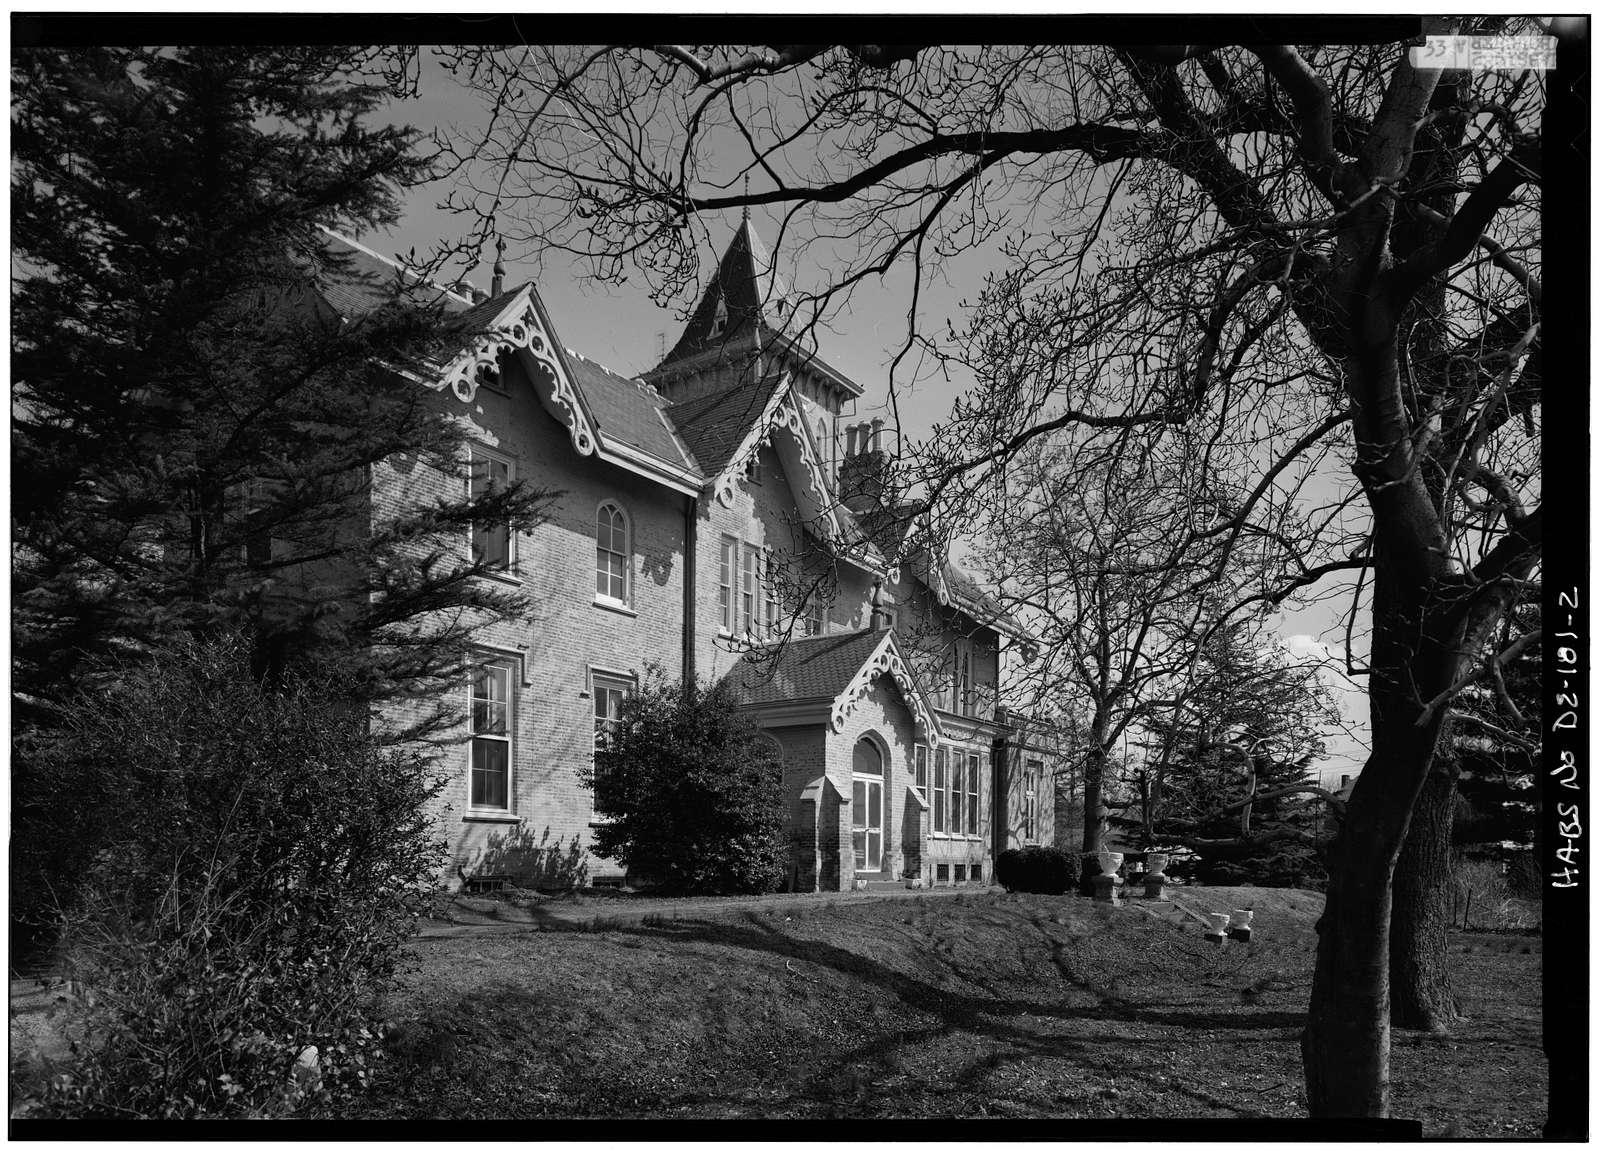 Lesley-Travers Mansion, 112 West Sixth Street, New Castle, New Castle County, DE